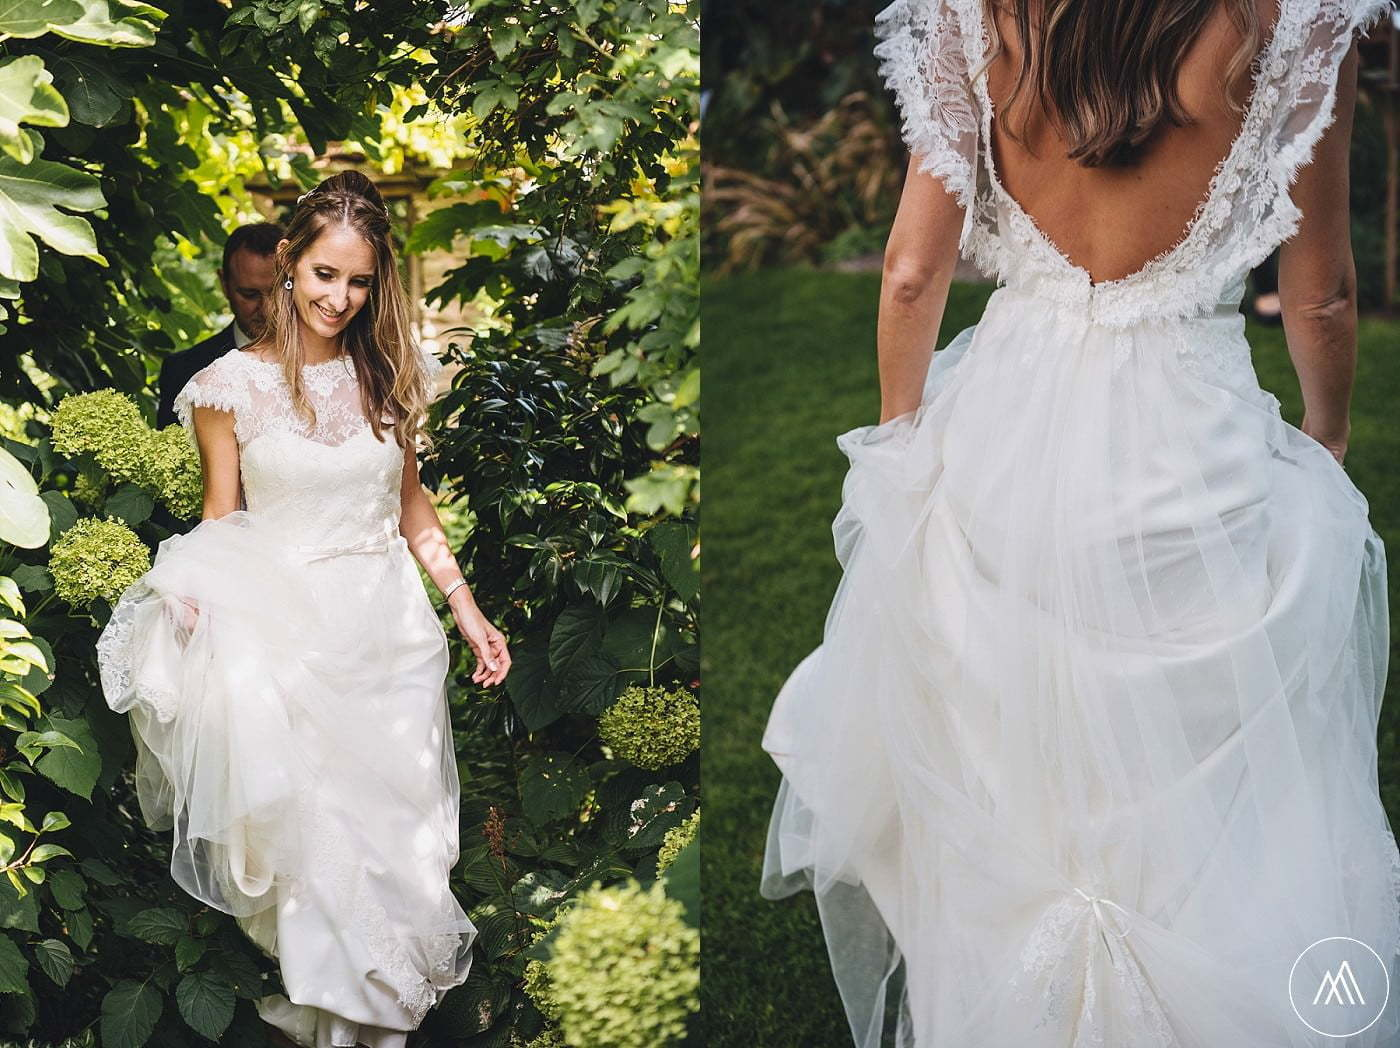 bride's dress Dewsall